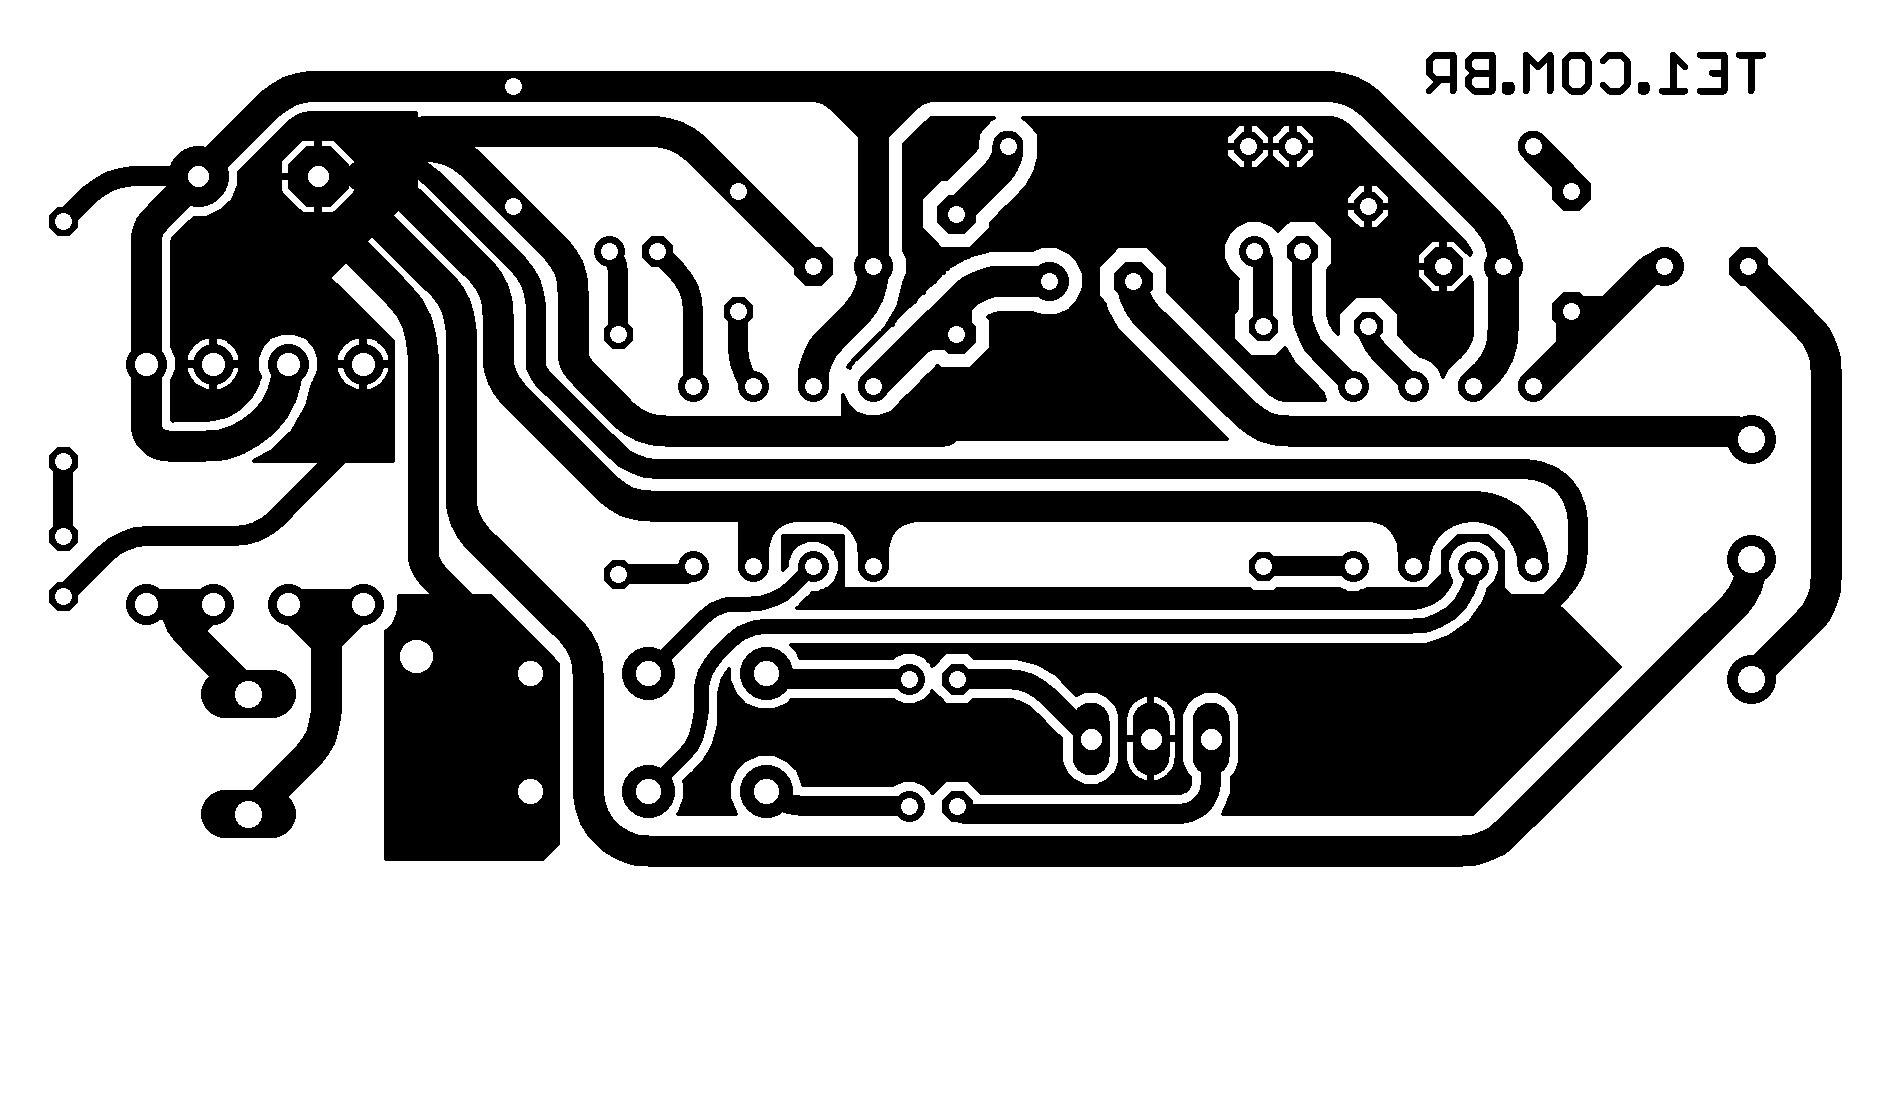 Circuito De Amplificador De Audio Estereo Com Lm386